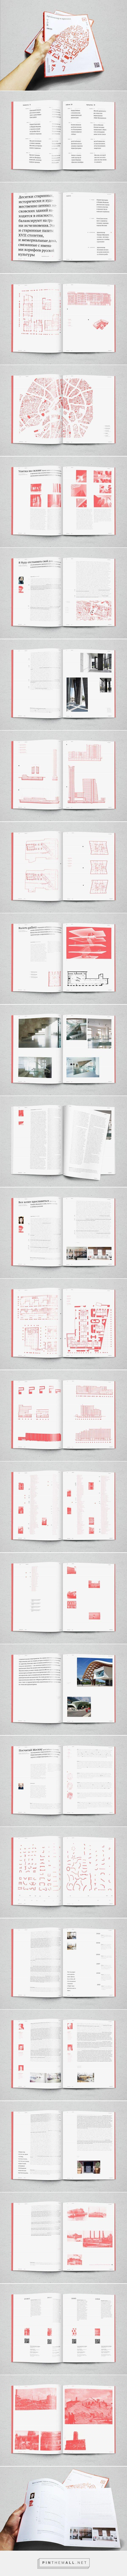 Magazine about modern architecture on Behance